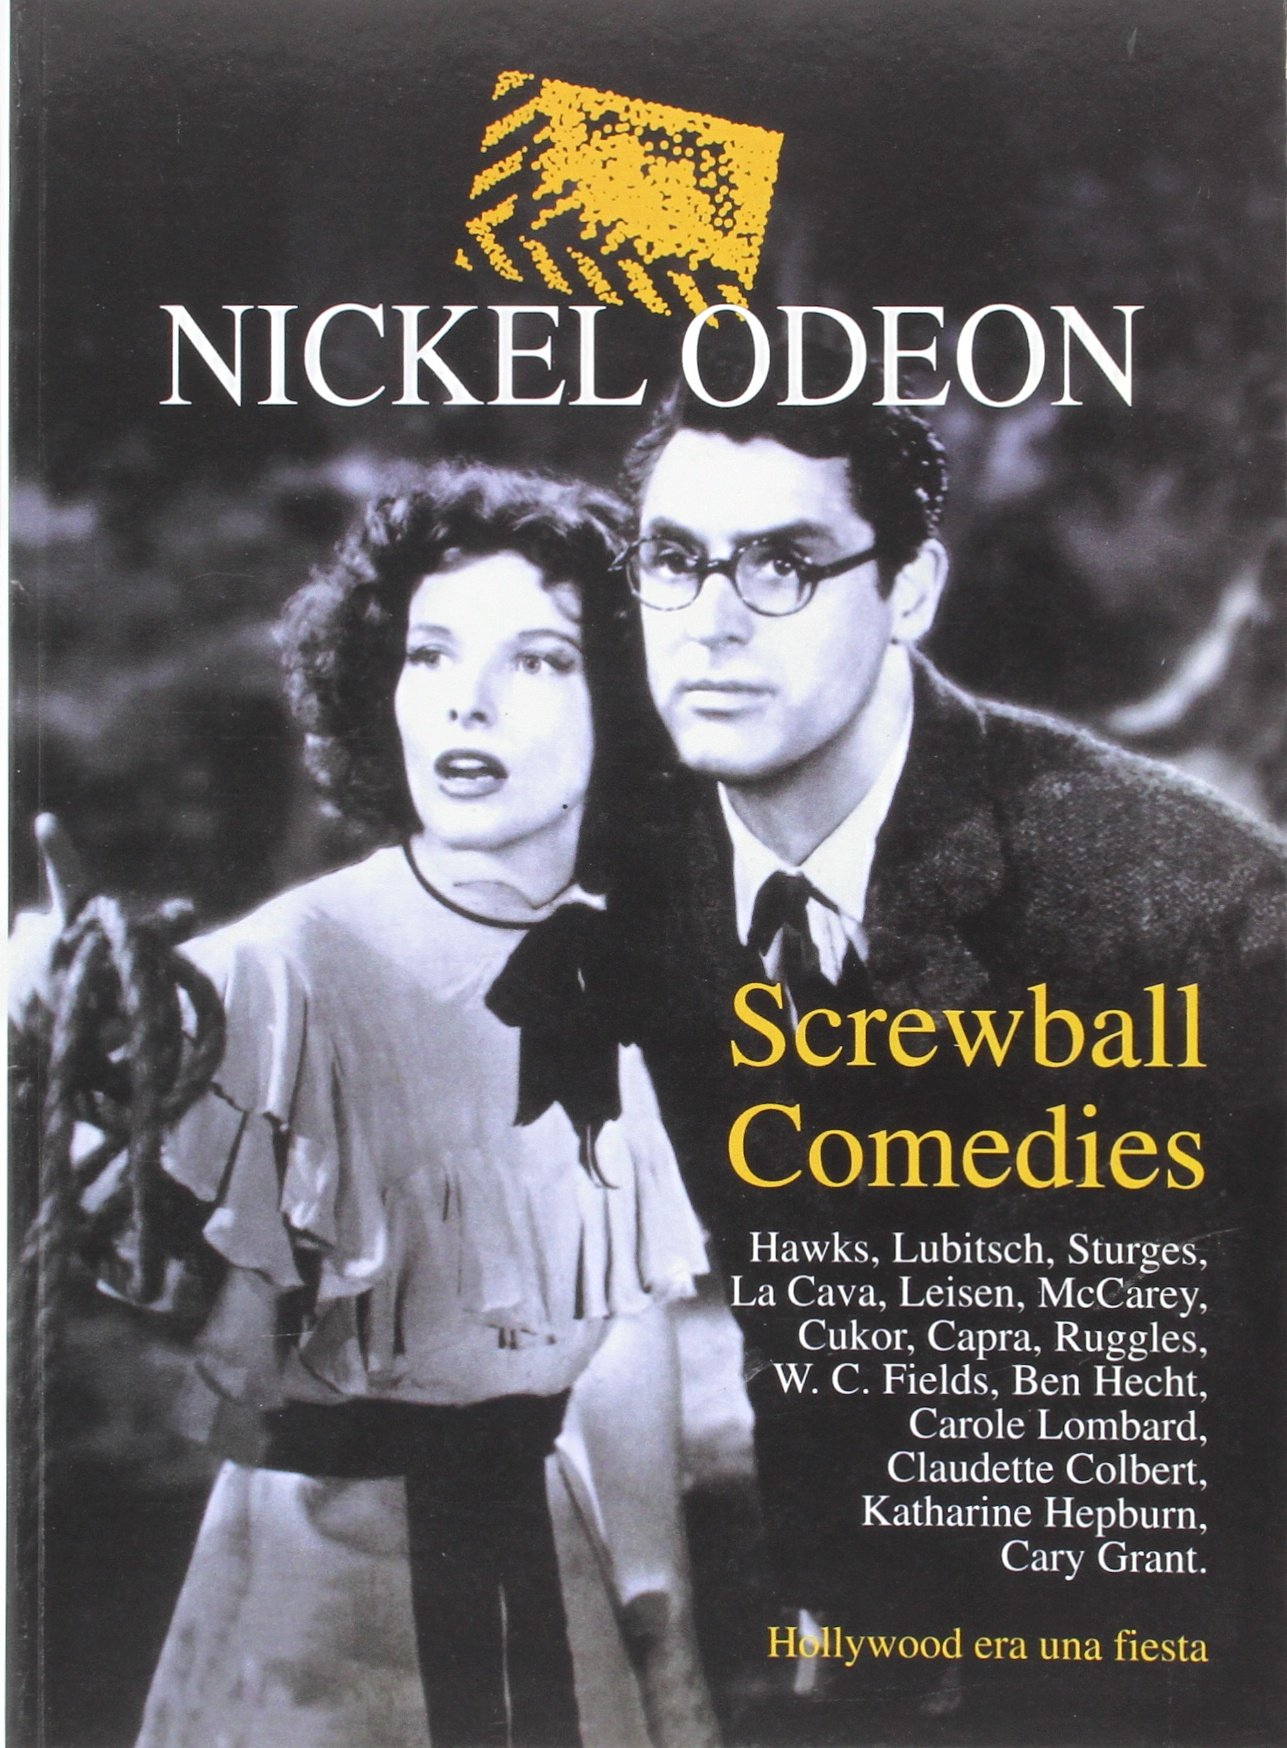 NICKEL ODEON: SCREWBALL COMEDIES: Amazon.es: Vv.Aa.: Libros